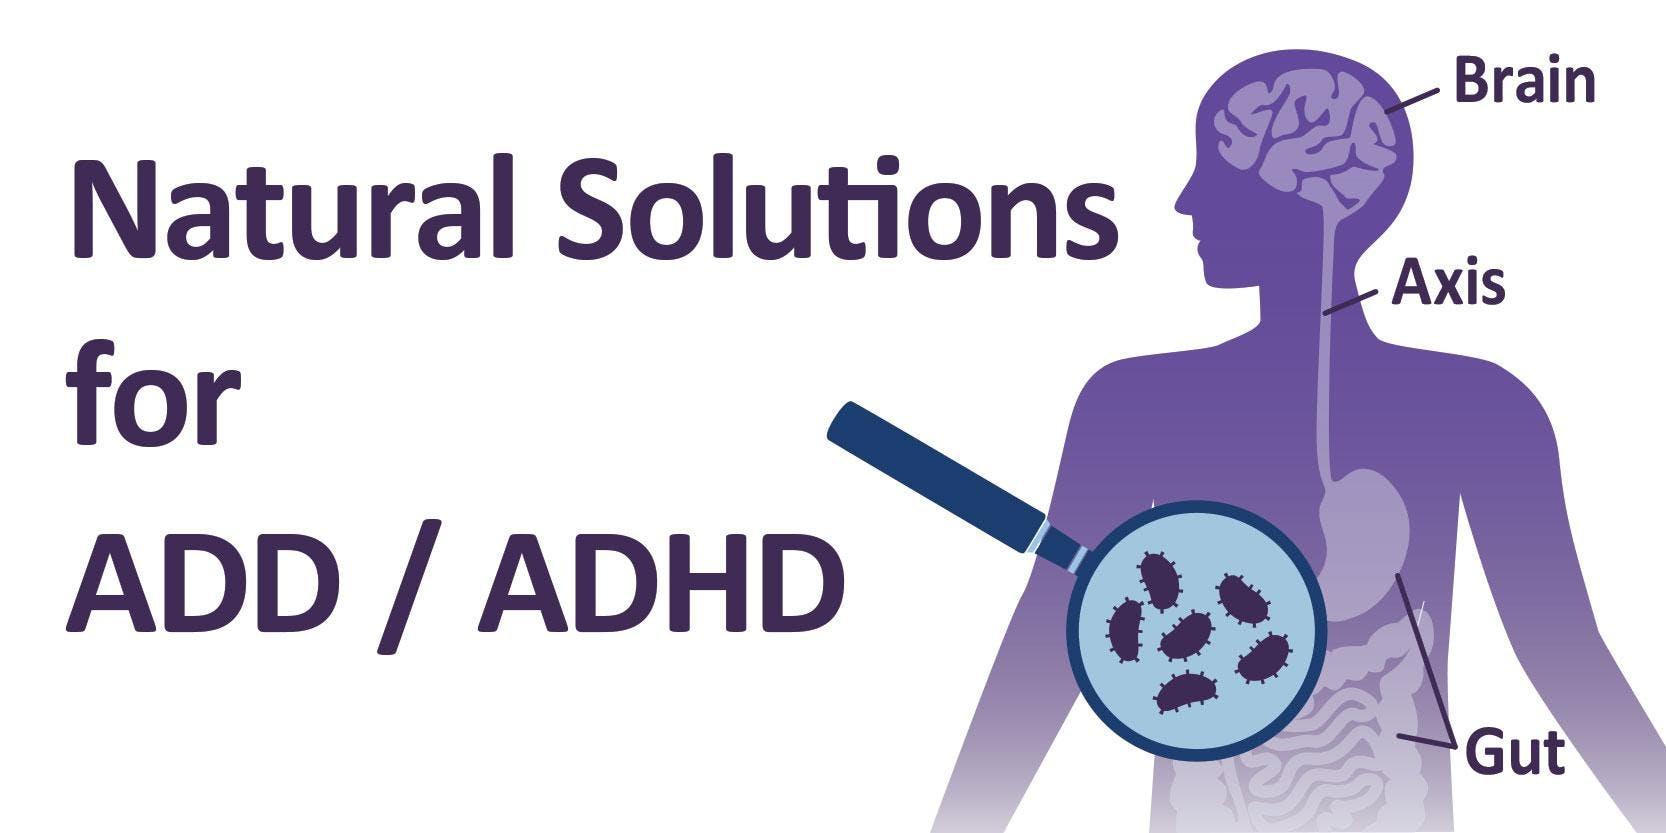 Natural Solutions for ADD / ADHD - Mesa, AZ